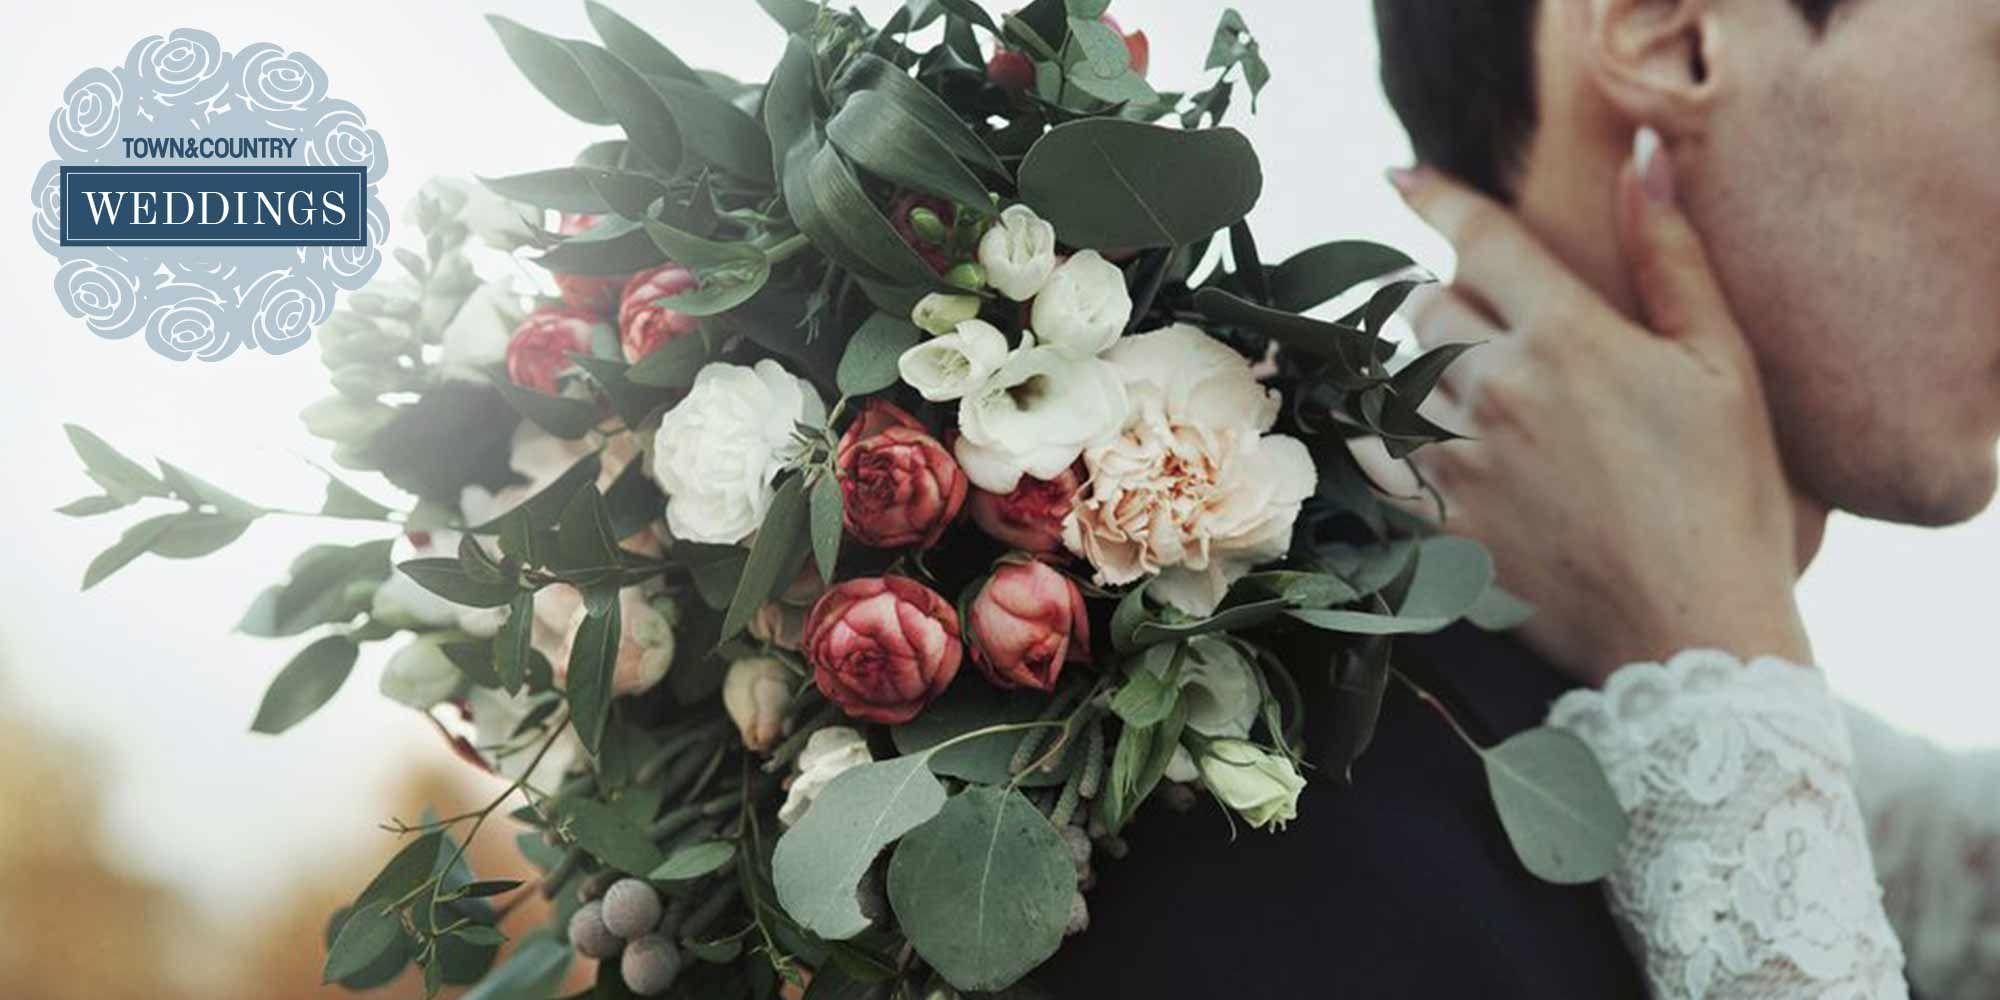 15 fall wedding bouquets best bridal flower ideas for fall weddings izmirmasajfo